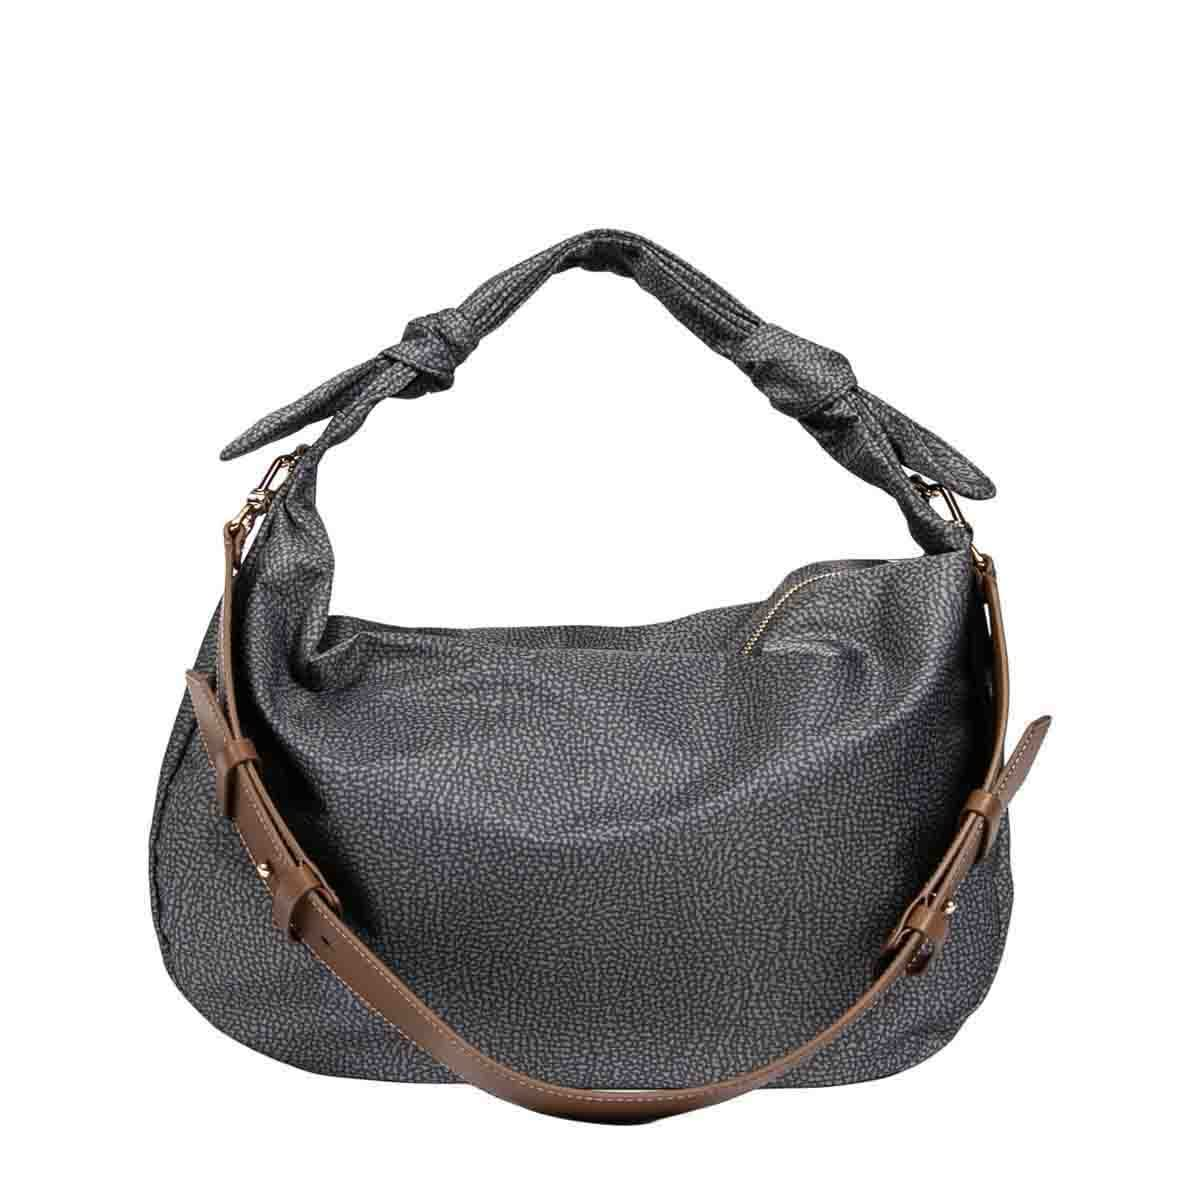 Medium Desert Shoulder Bag